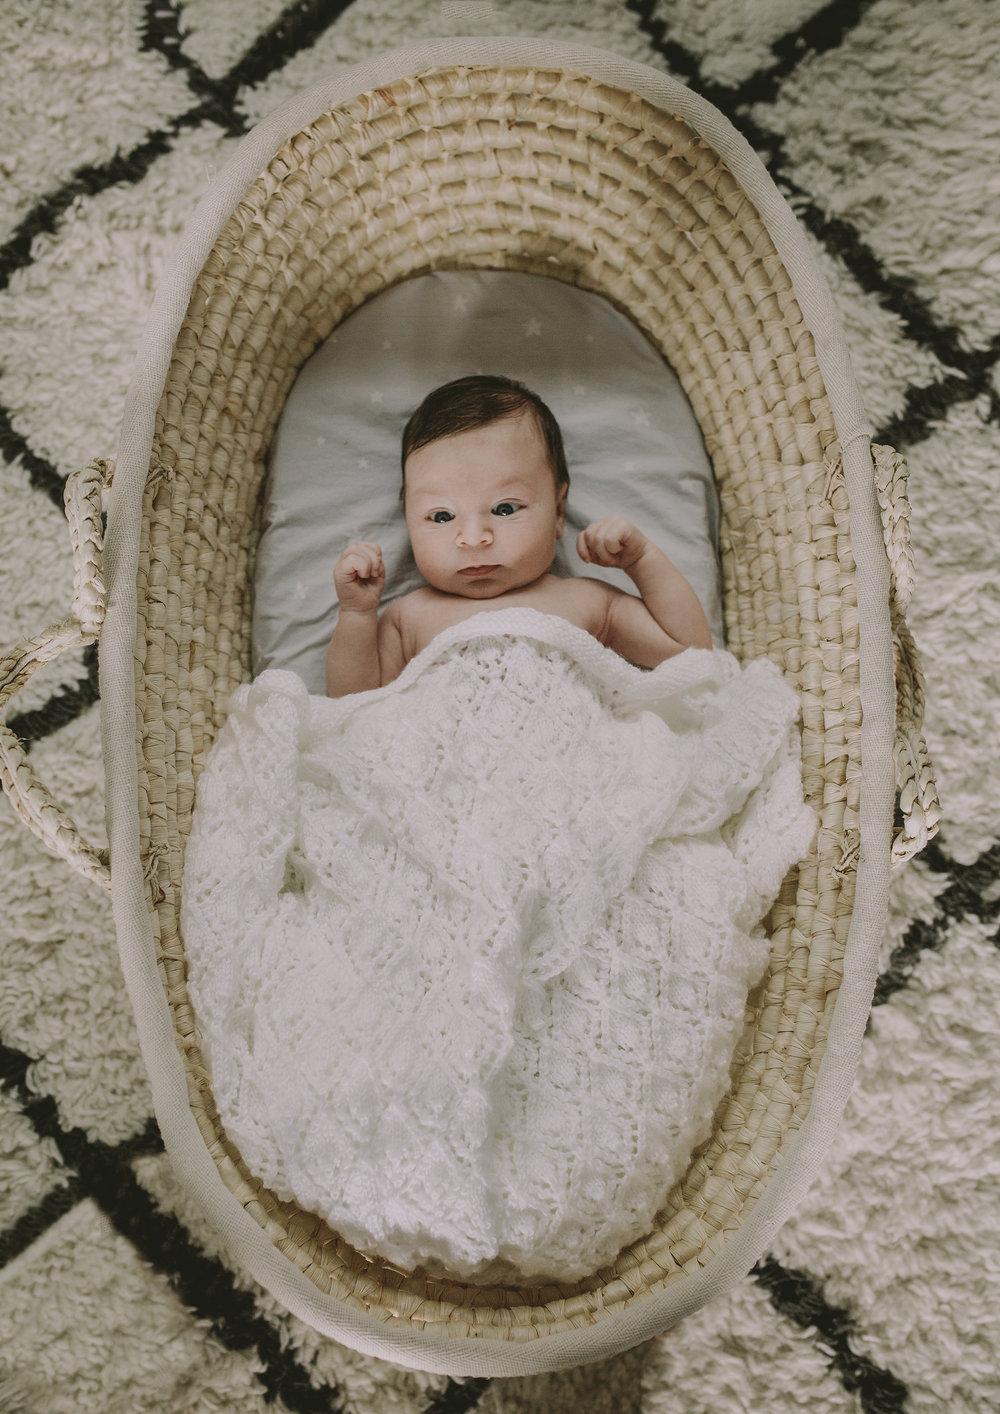 Newborn Baby Boy in his bassinet